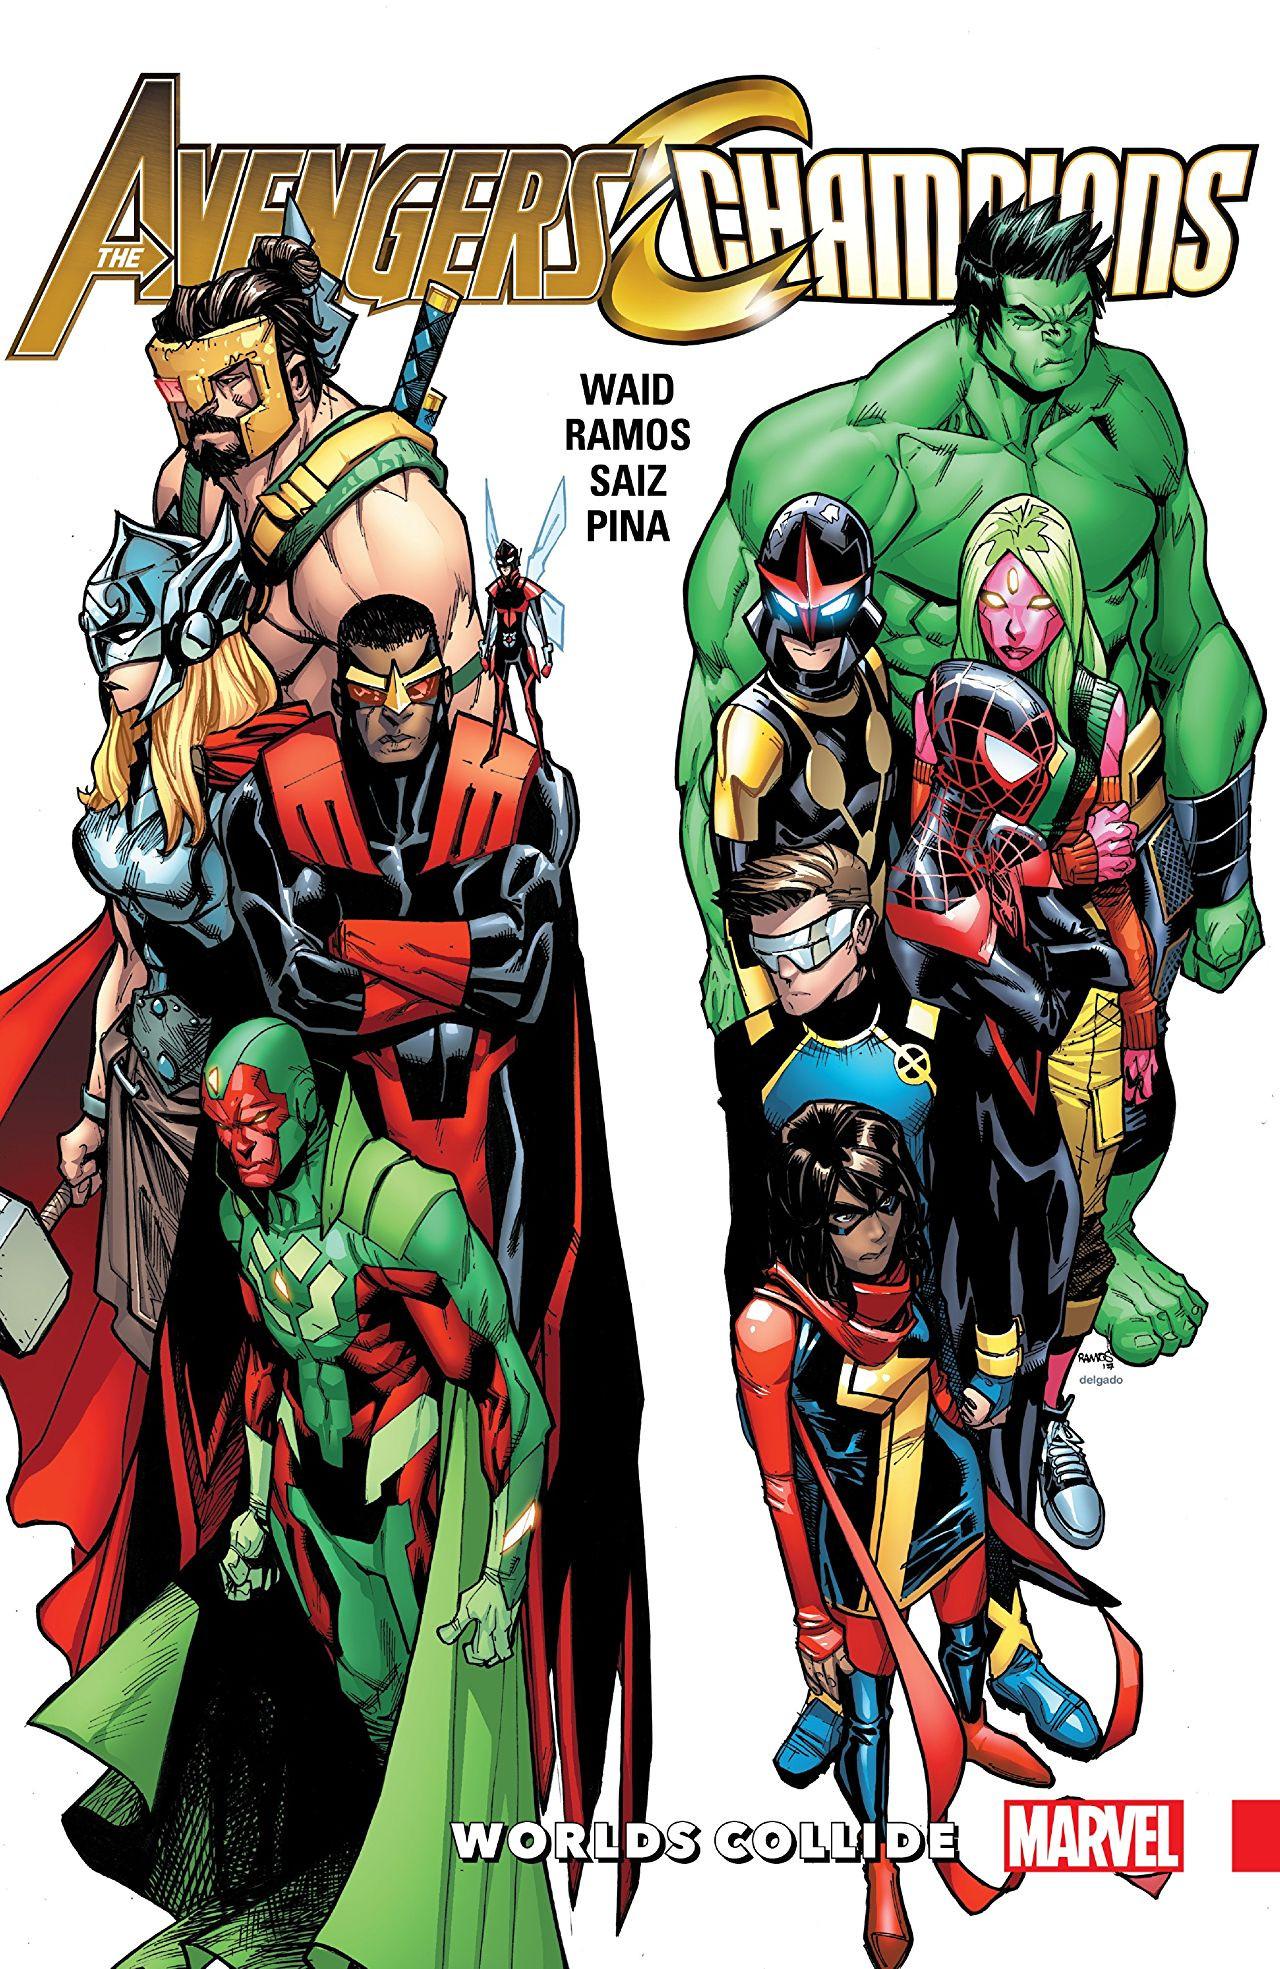 Avengers & Champions: Worlds Collide TPB Vol 1